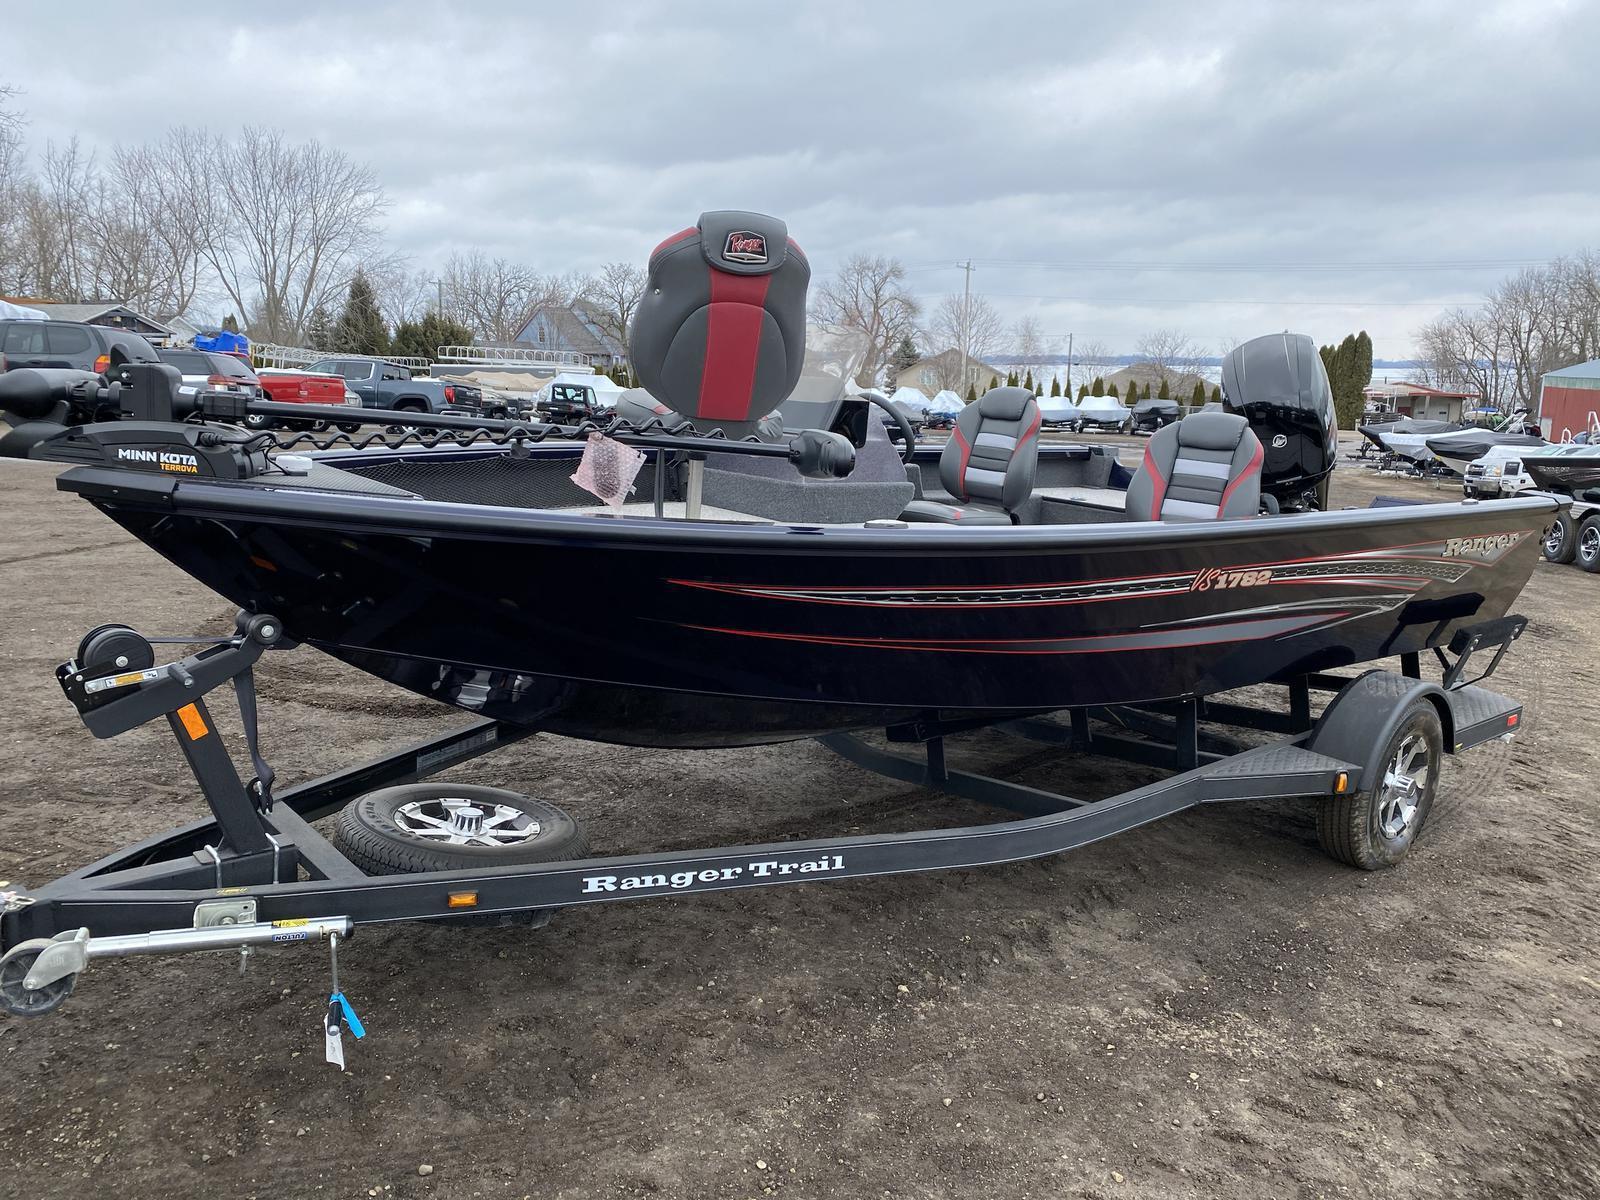 2019 Ranger VS1782 SC side console w/ 150hp Mercury fourstroke! for sale in Stoughton, WI. Quam's Marine & Motor Sports Stoughton, WI (608) 873-3366